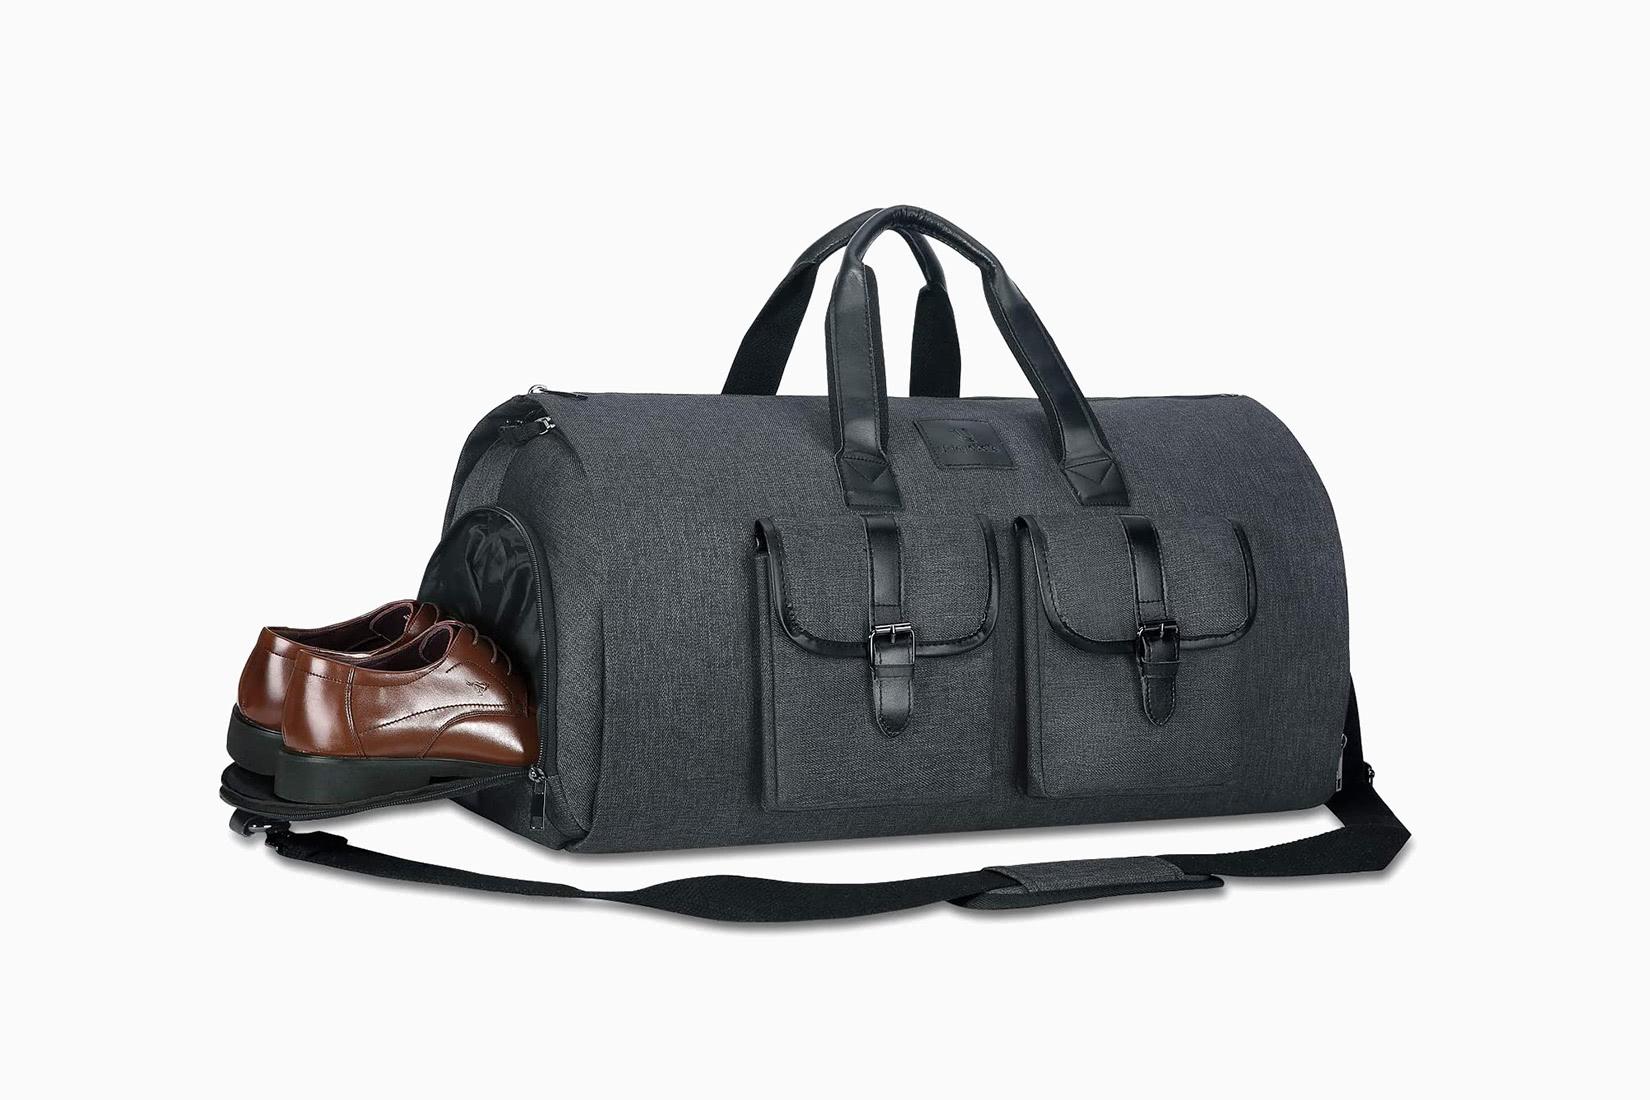 best garment bags duffel uniquebella review - Luxe Digital